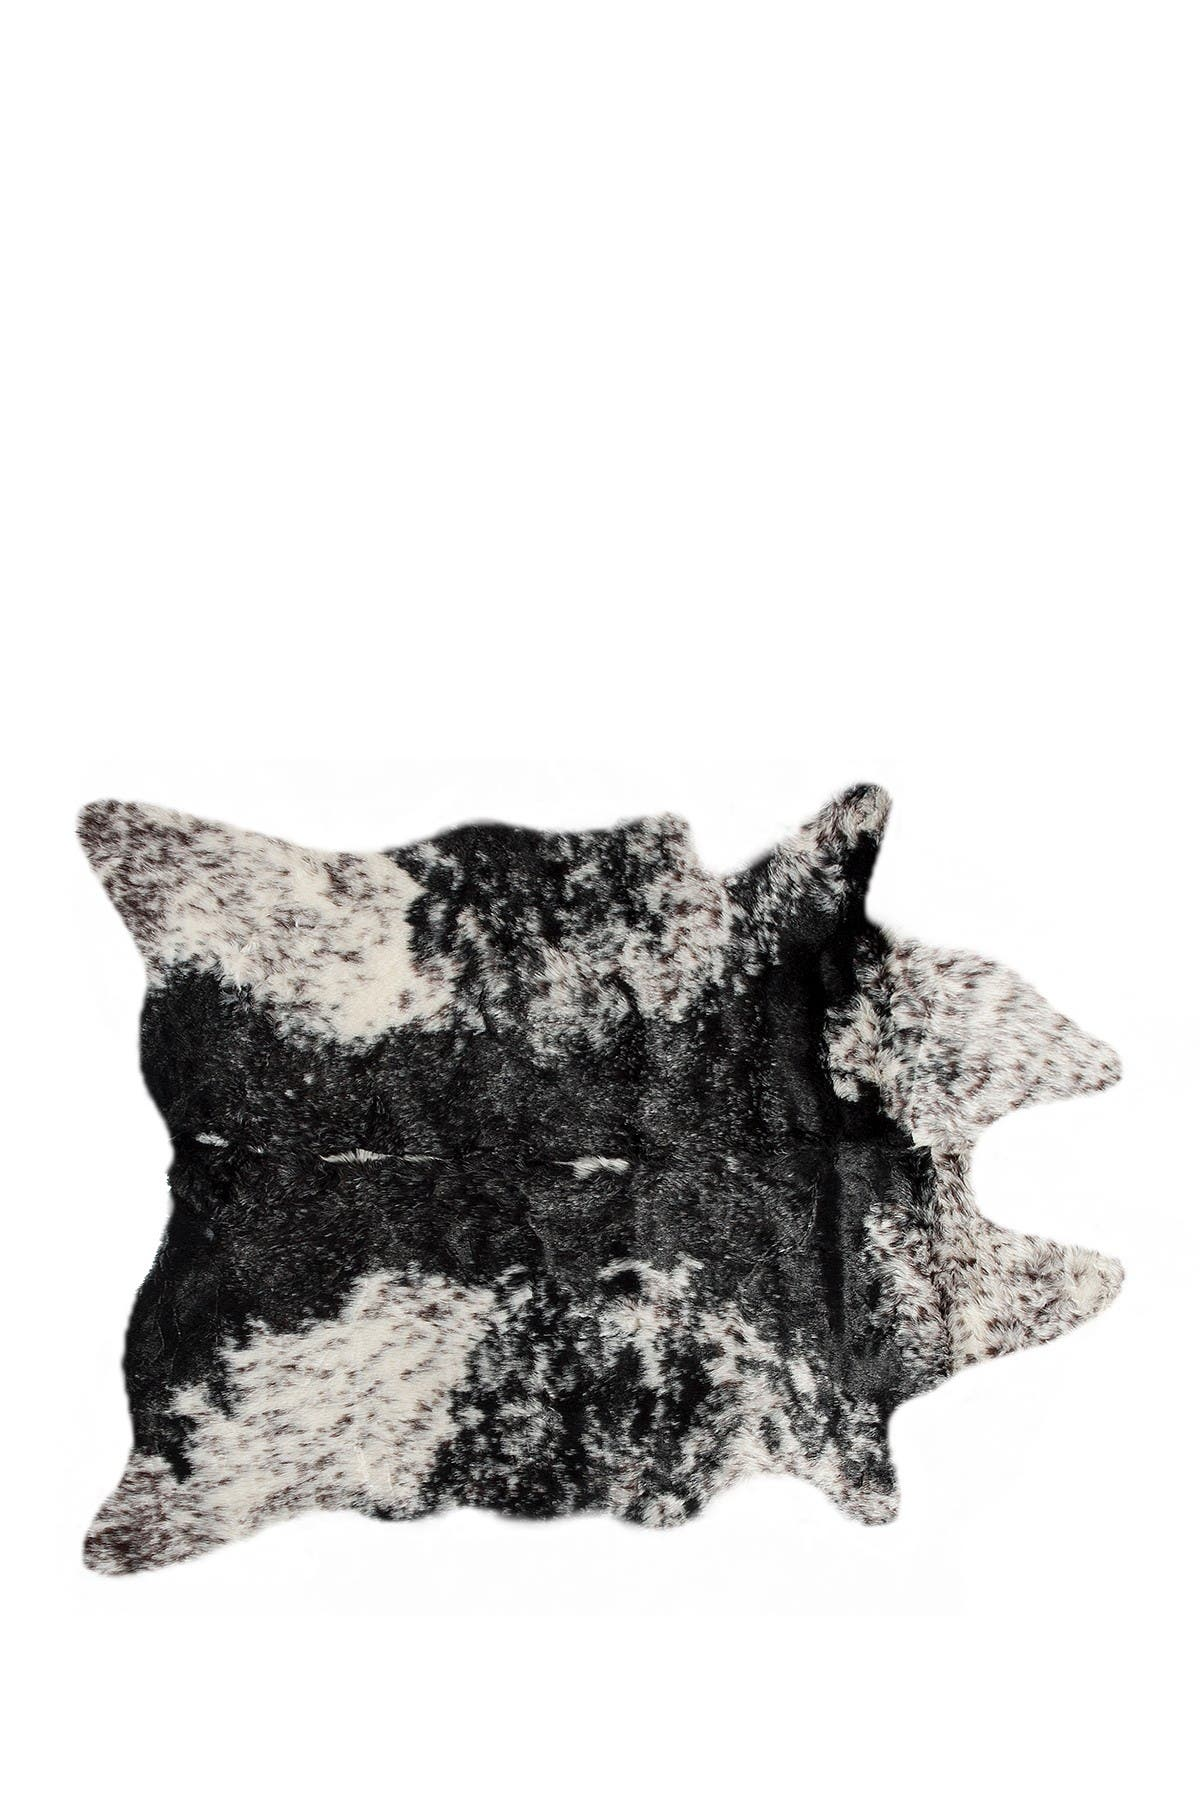 Image of LUXE Edinburgh Black/White Faux Hide Rug - 4.25 ft x 5ft